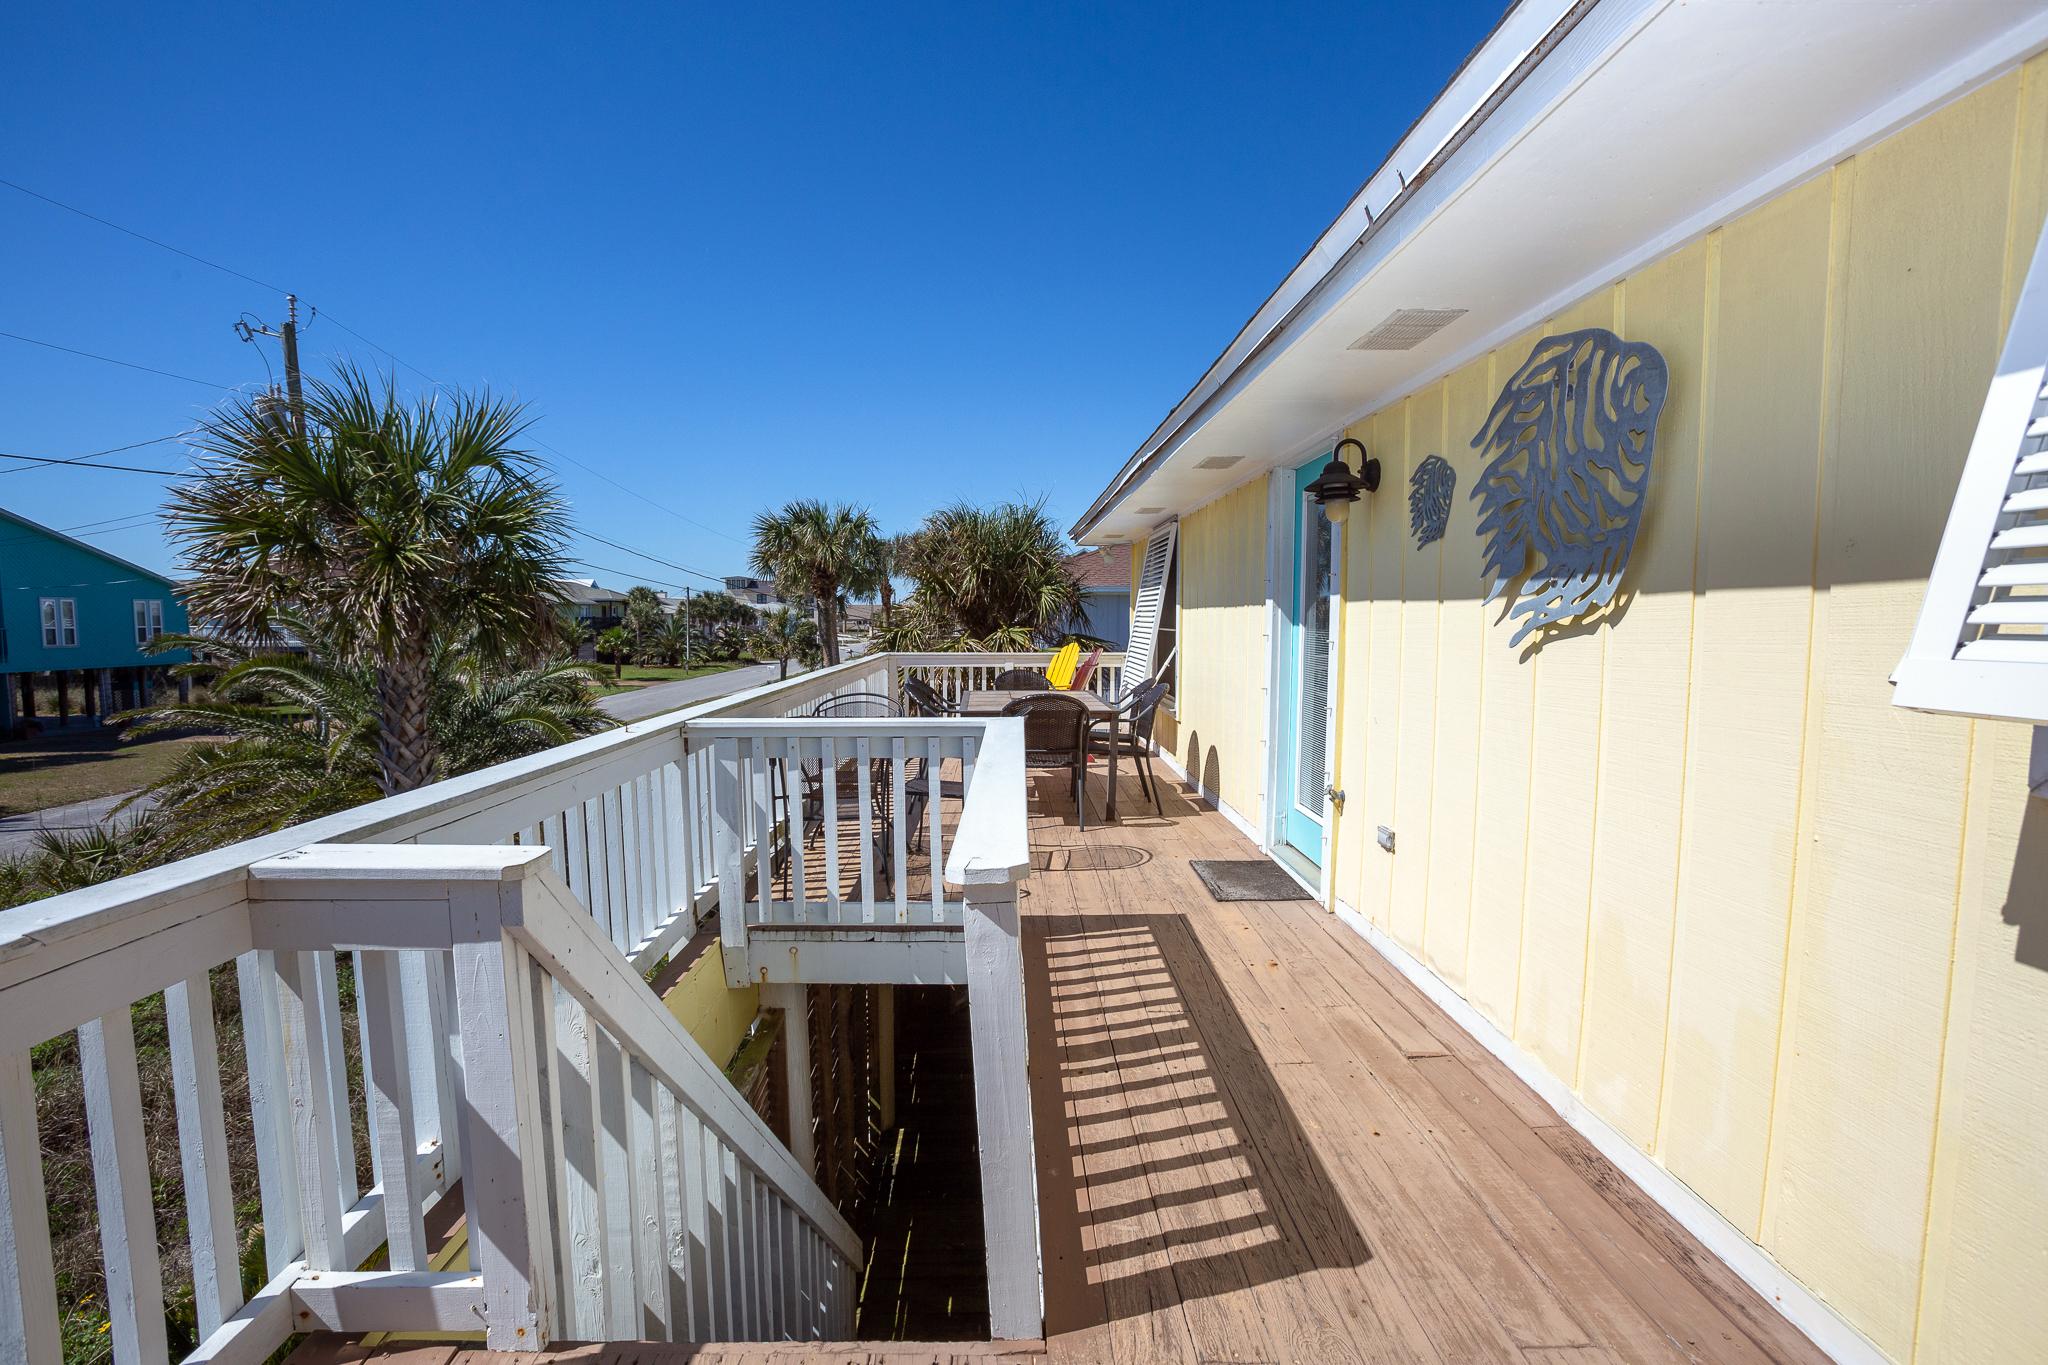 Maldonado 1015 - Sea the Big Picture House/Cottage rental in Pensacola Beach House Rentals in Pensacola Beach Florida - #32